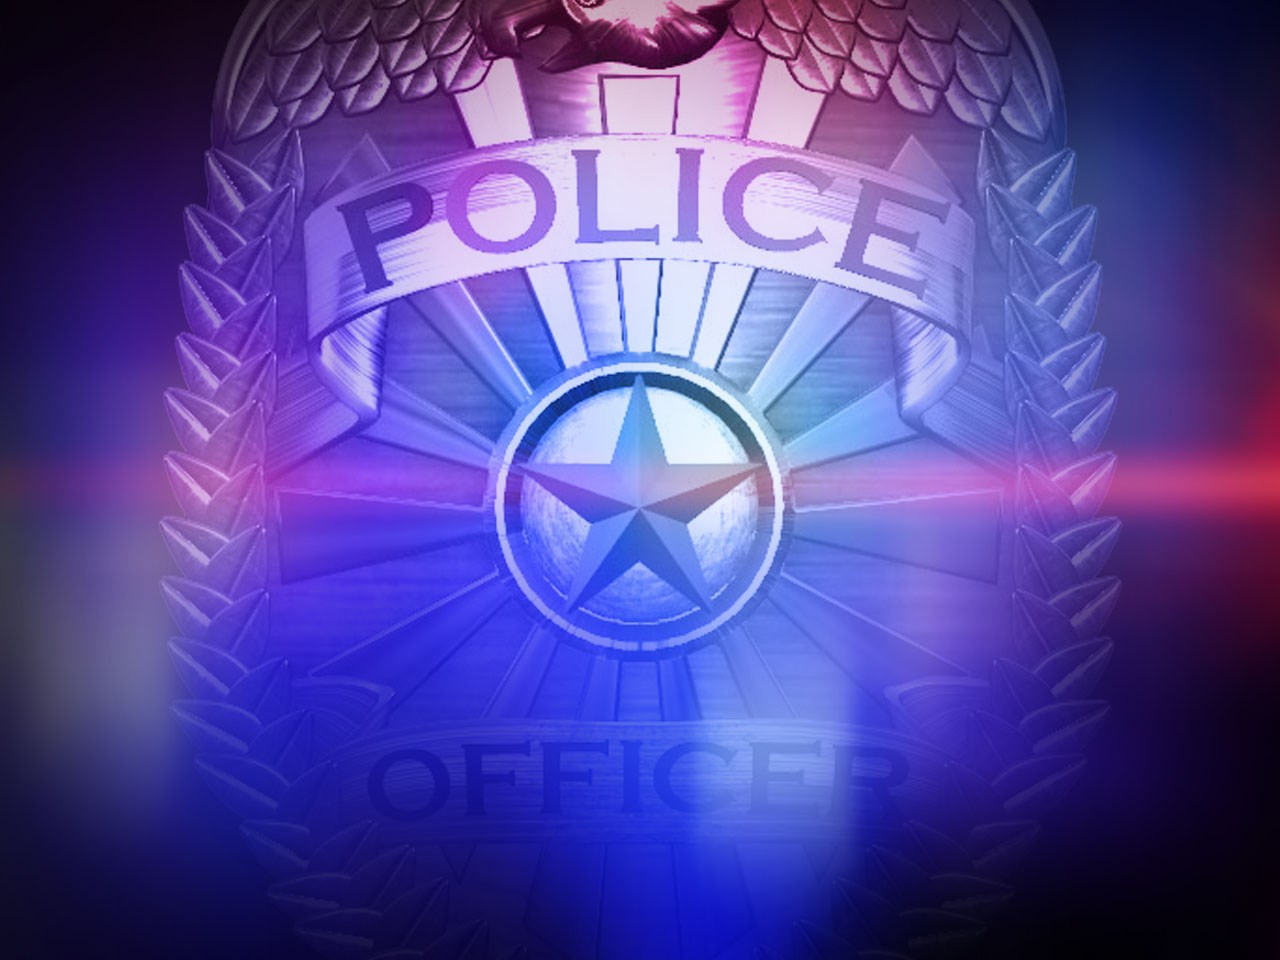 Police Lights 1_1557001771294.jpg.jpg